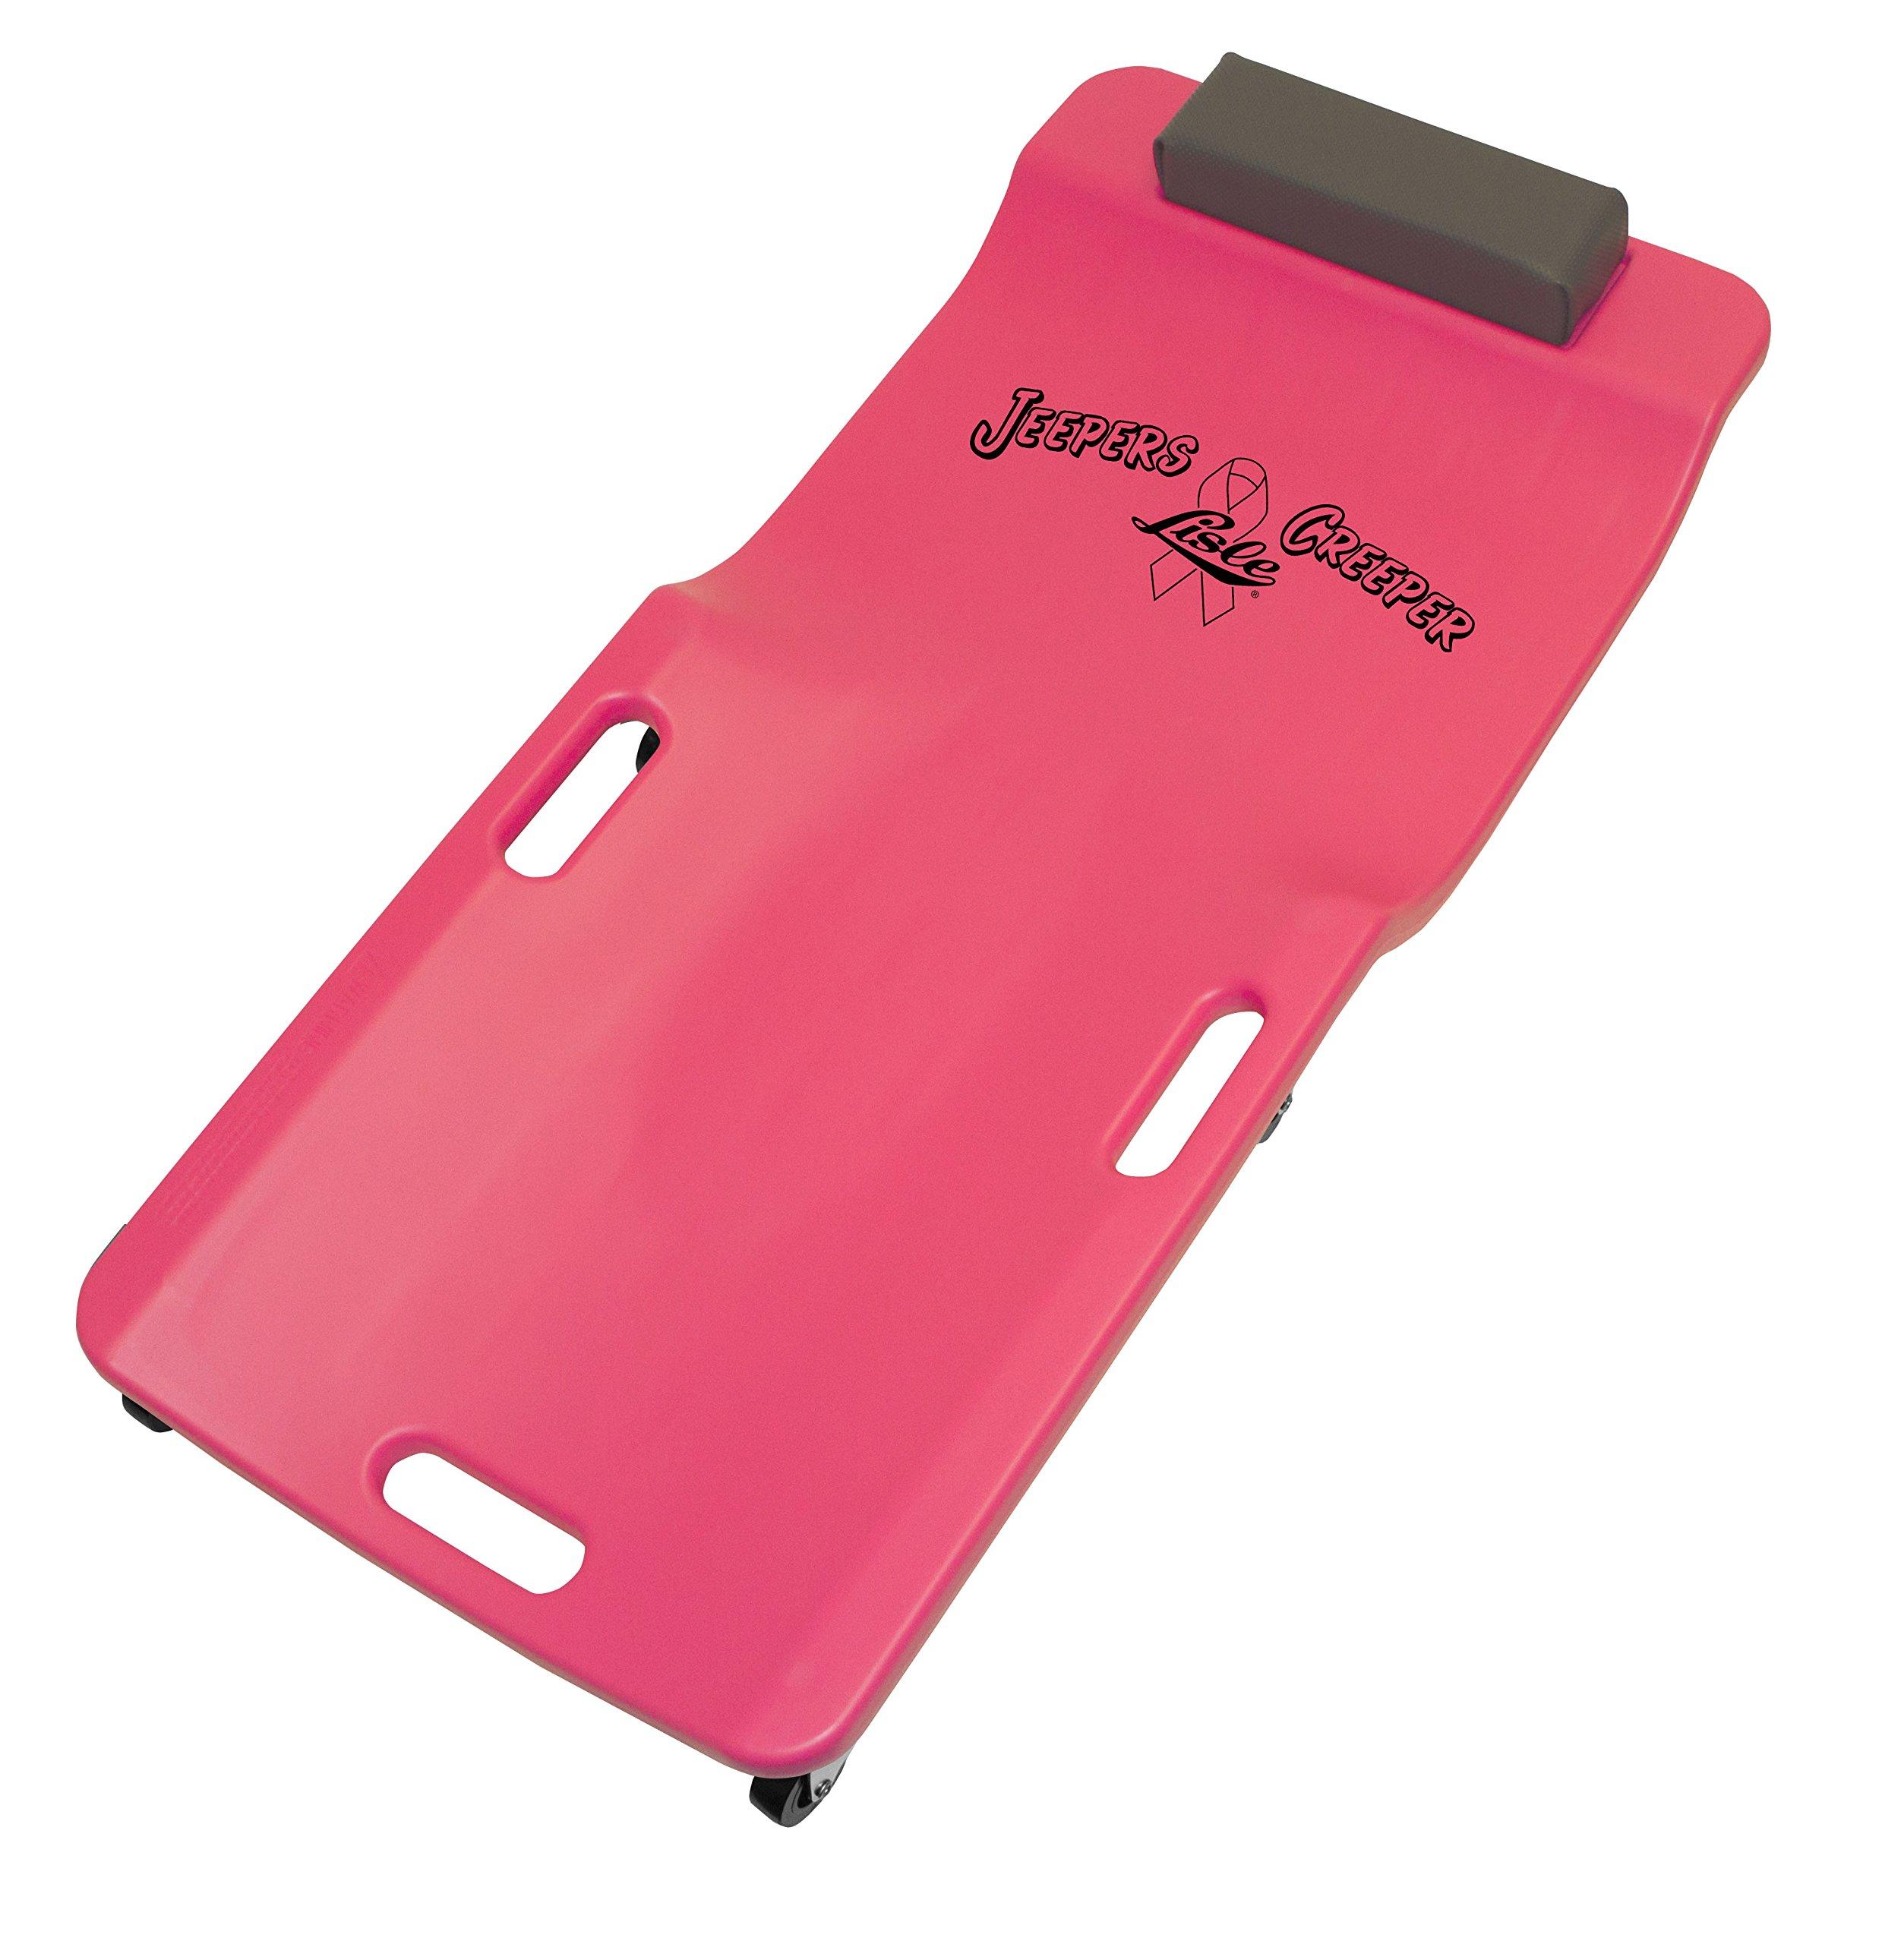 Lisle 93602 Pink Low Profile Plastic Creeper